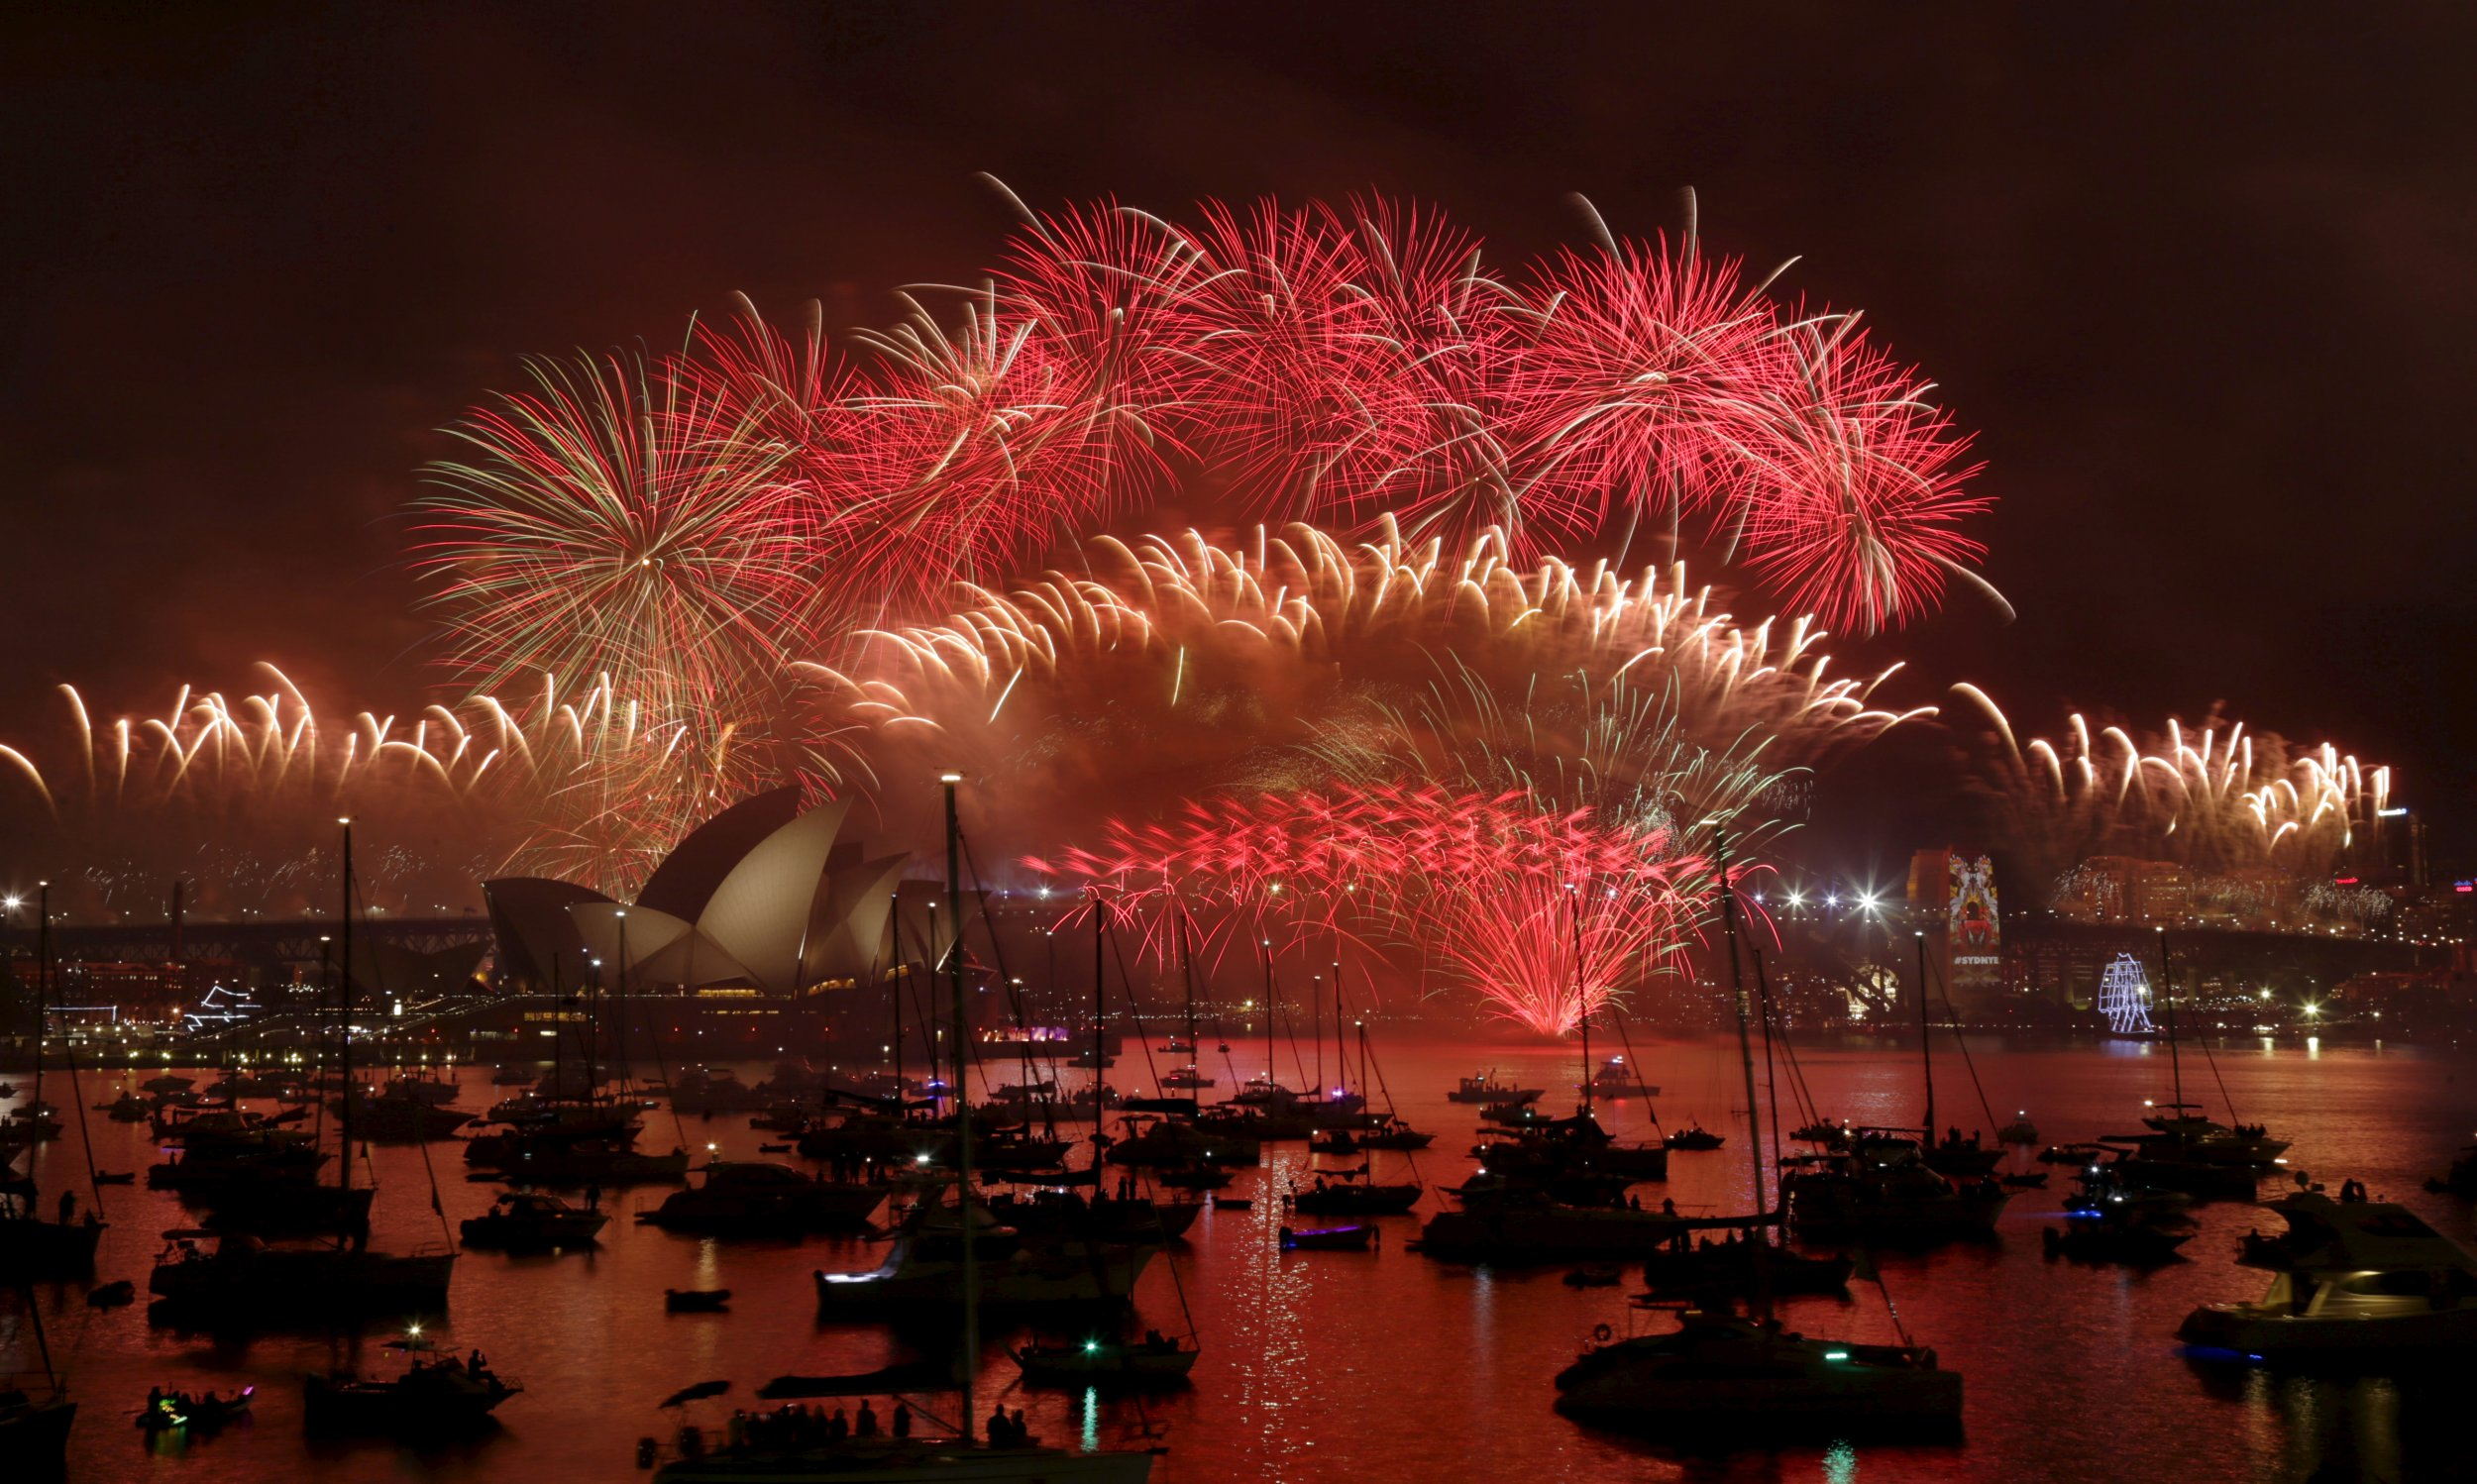 12-31-15 Sydney Opera House fireworks